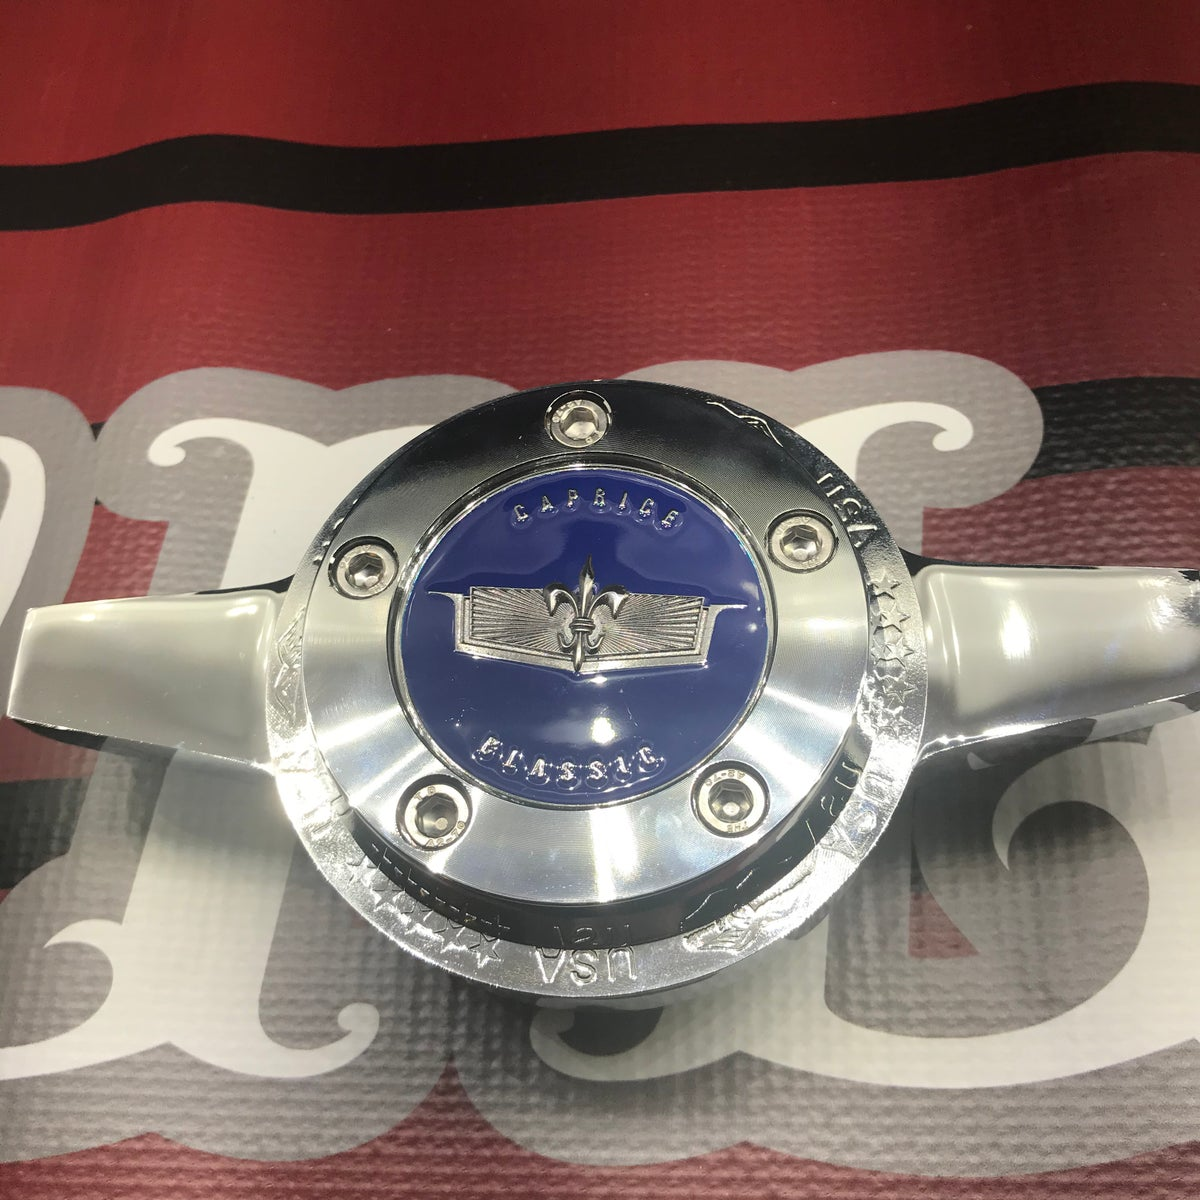 Image of Caprice blue chips 21/4 set